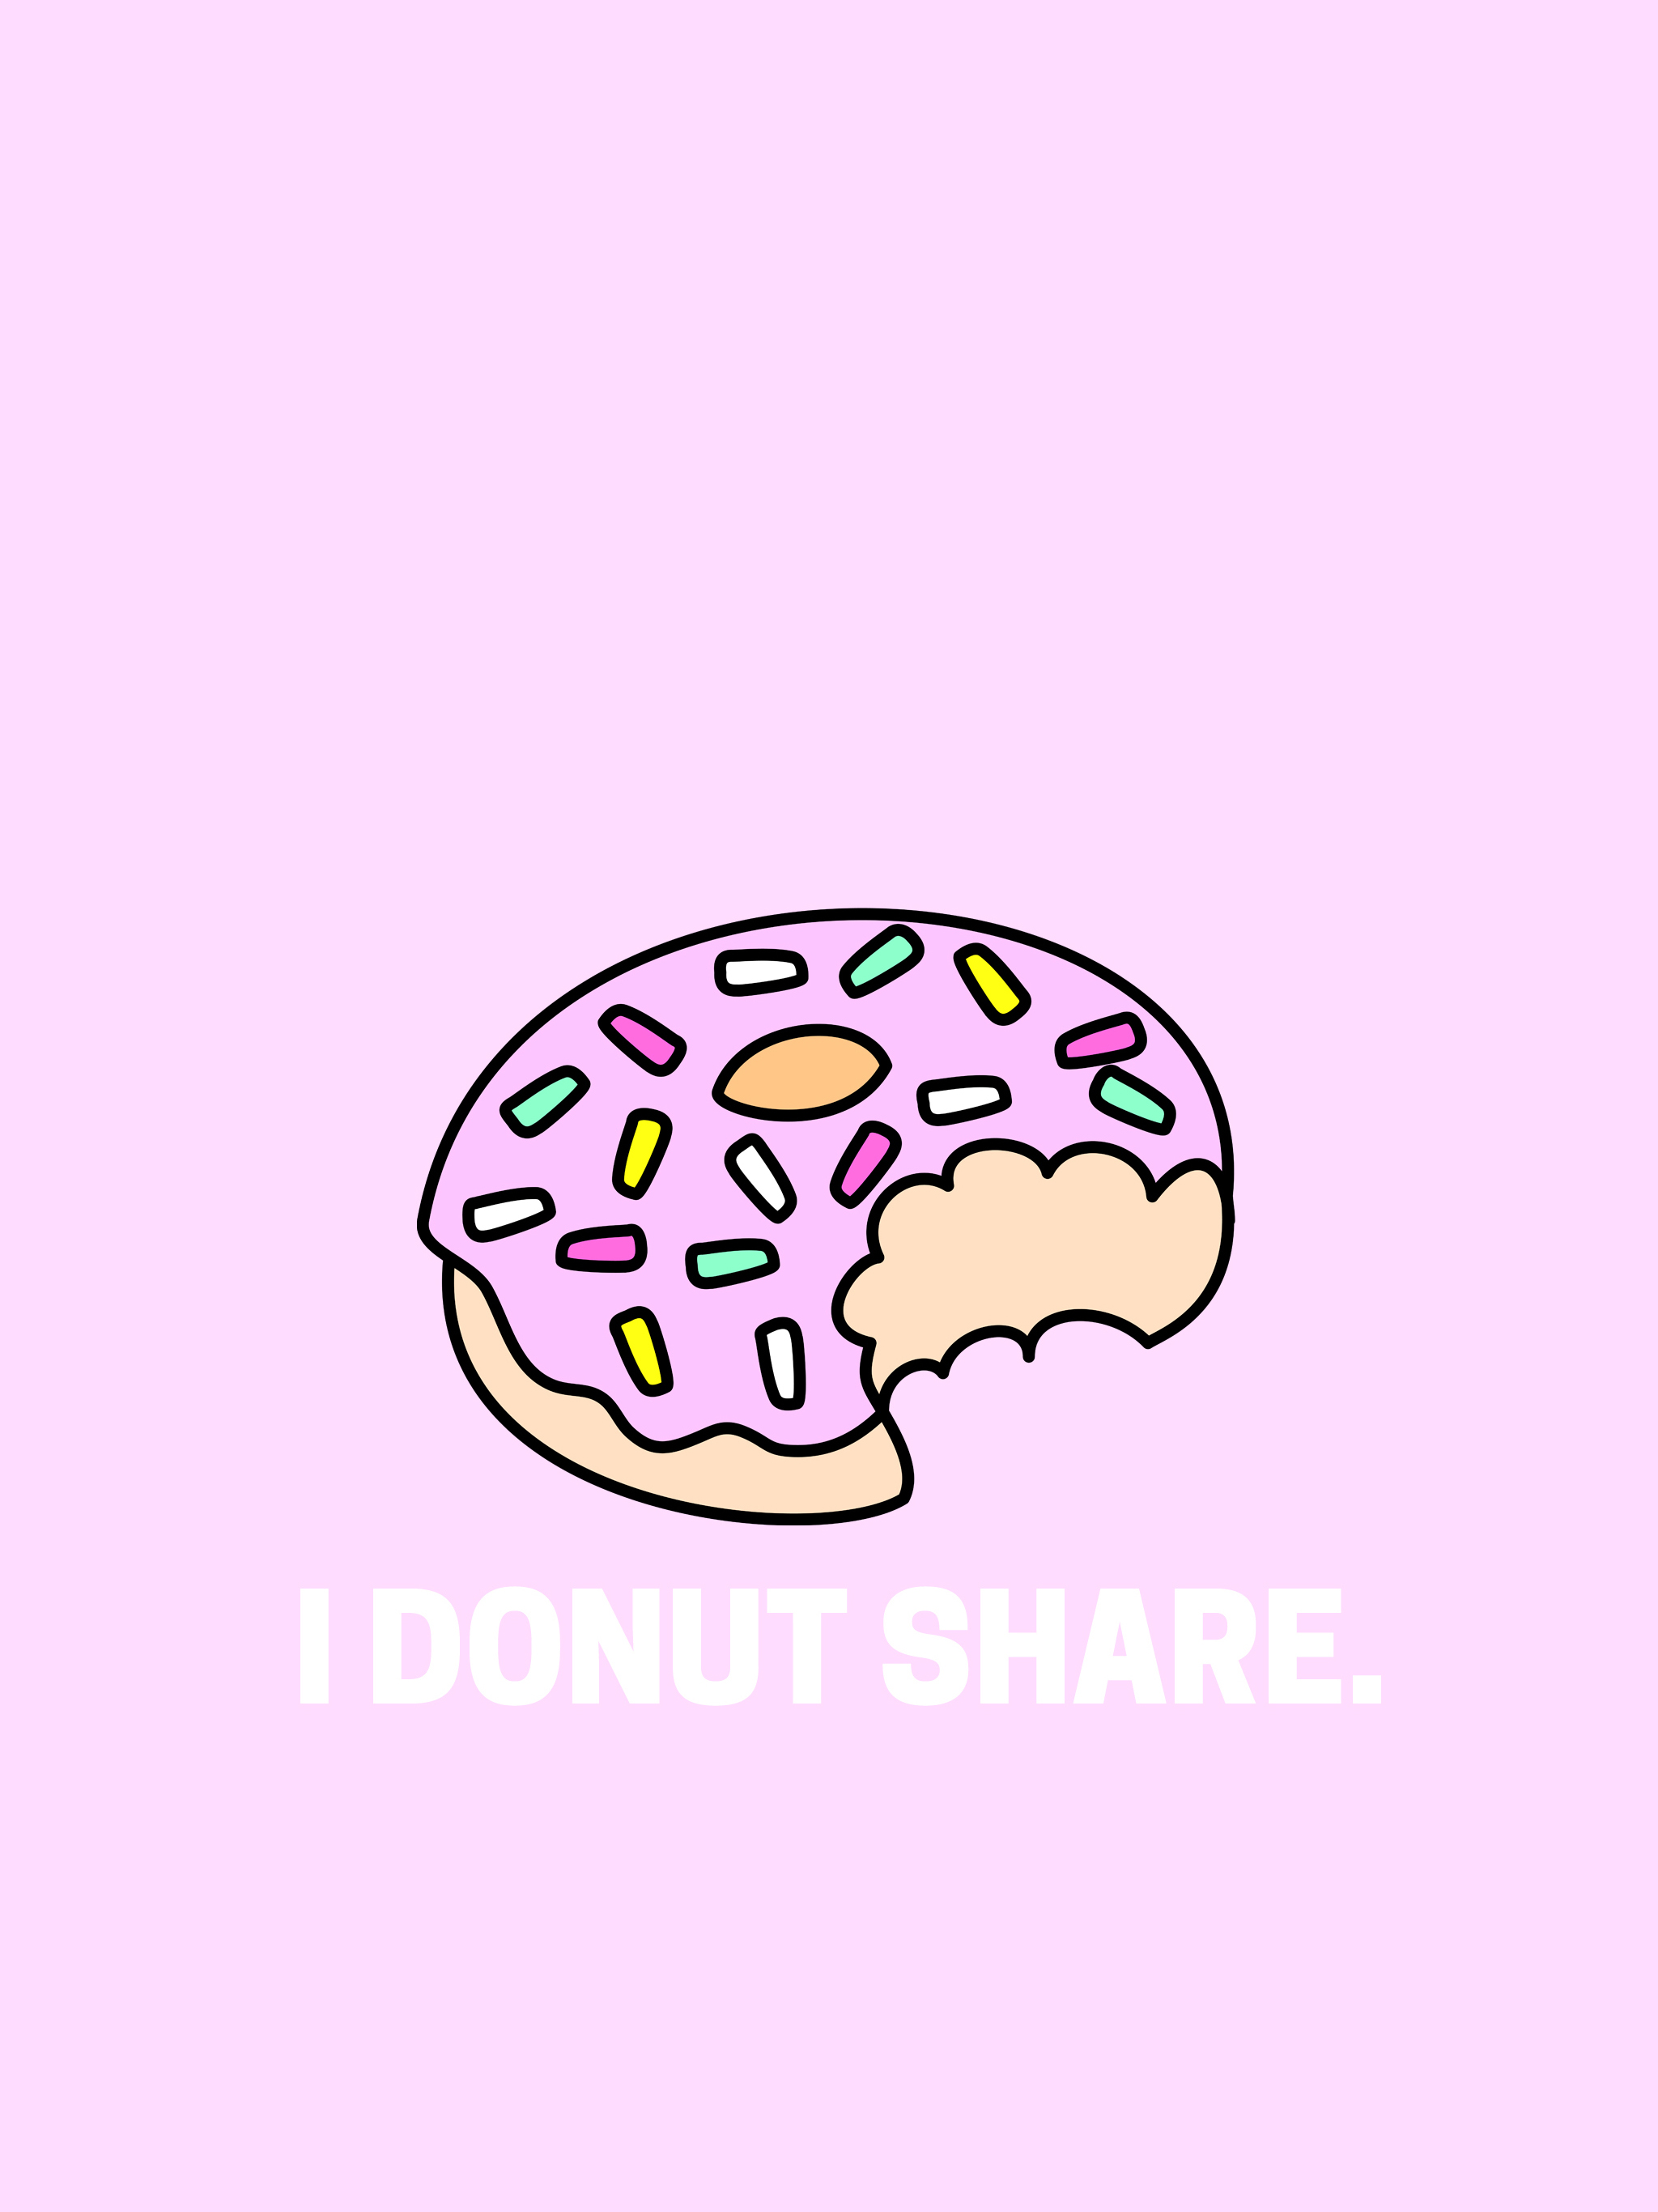 I Donut Share Free Desktop Wallpaper